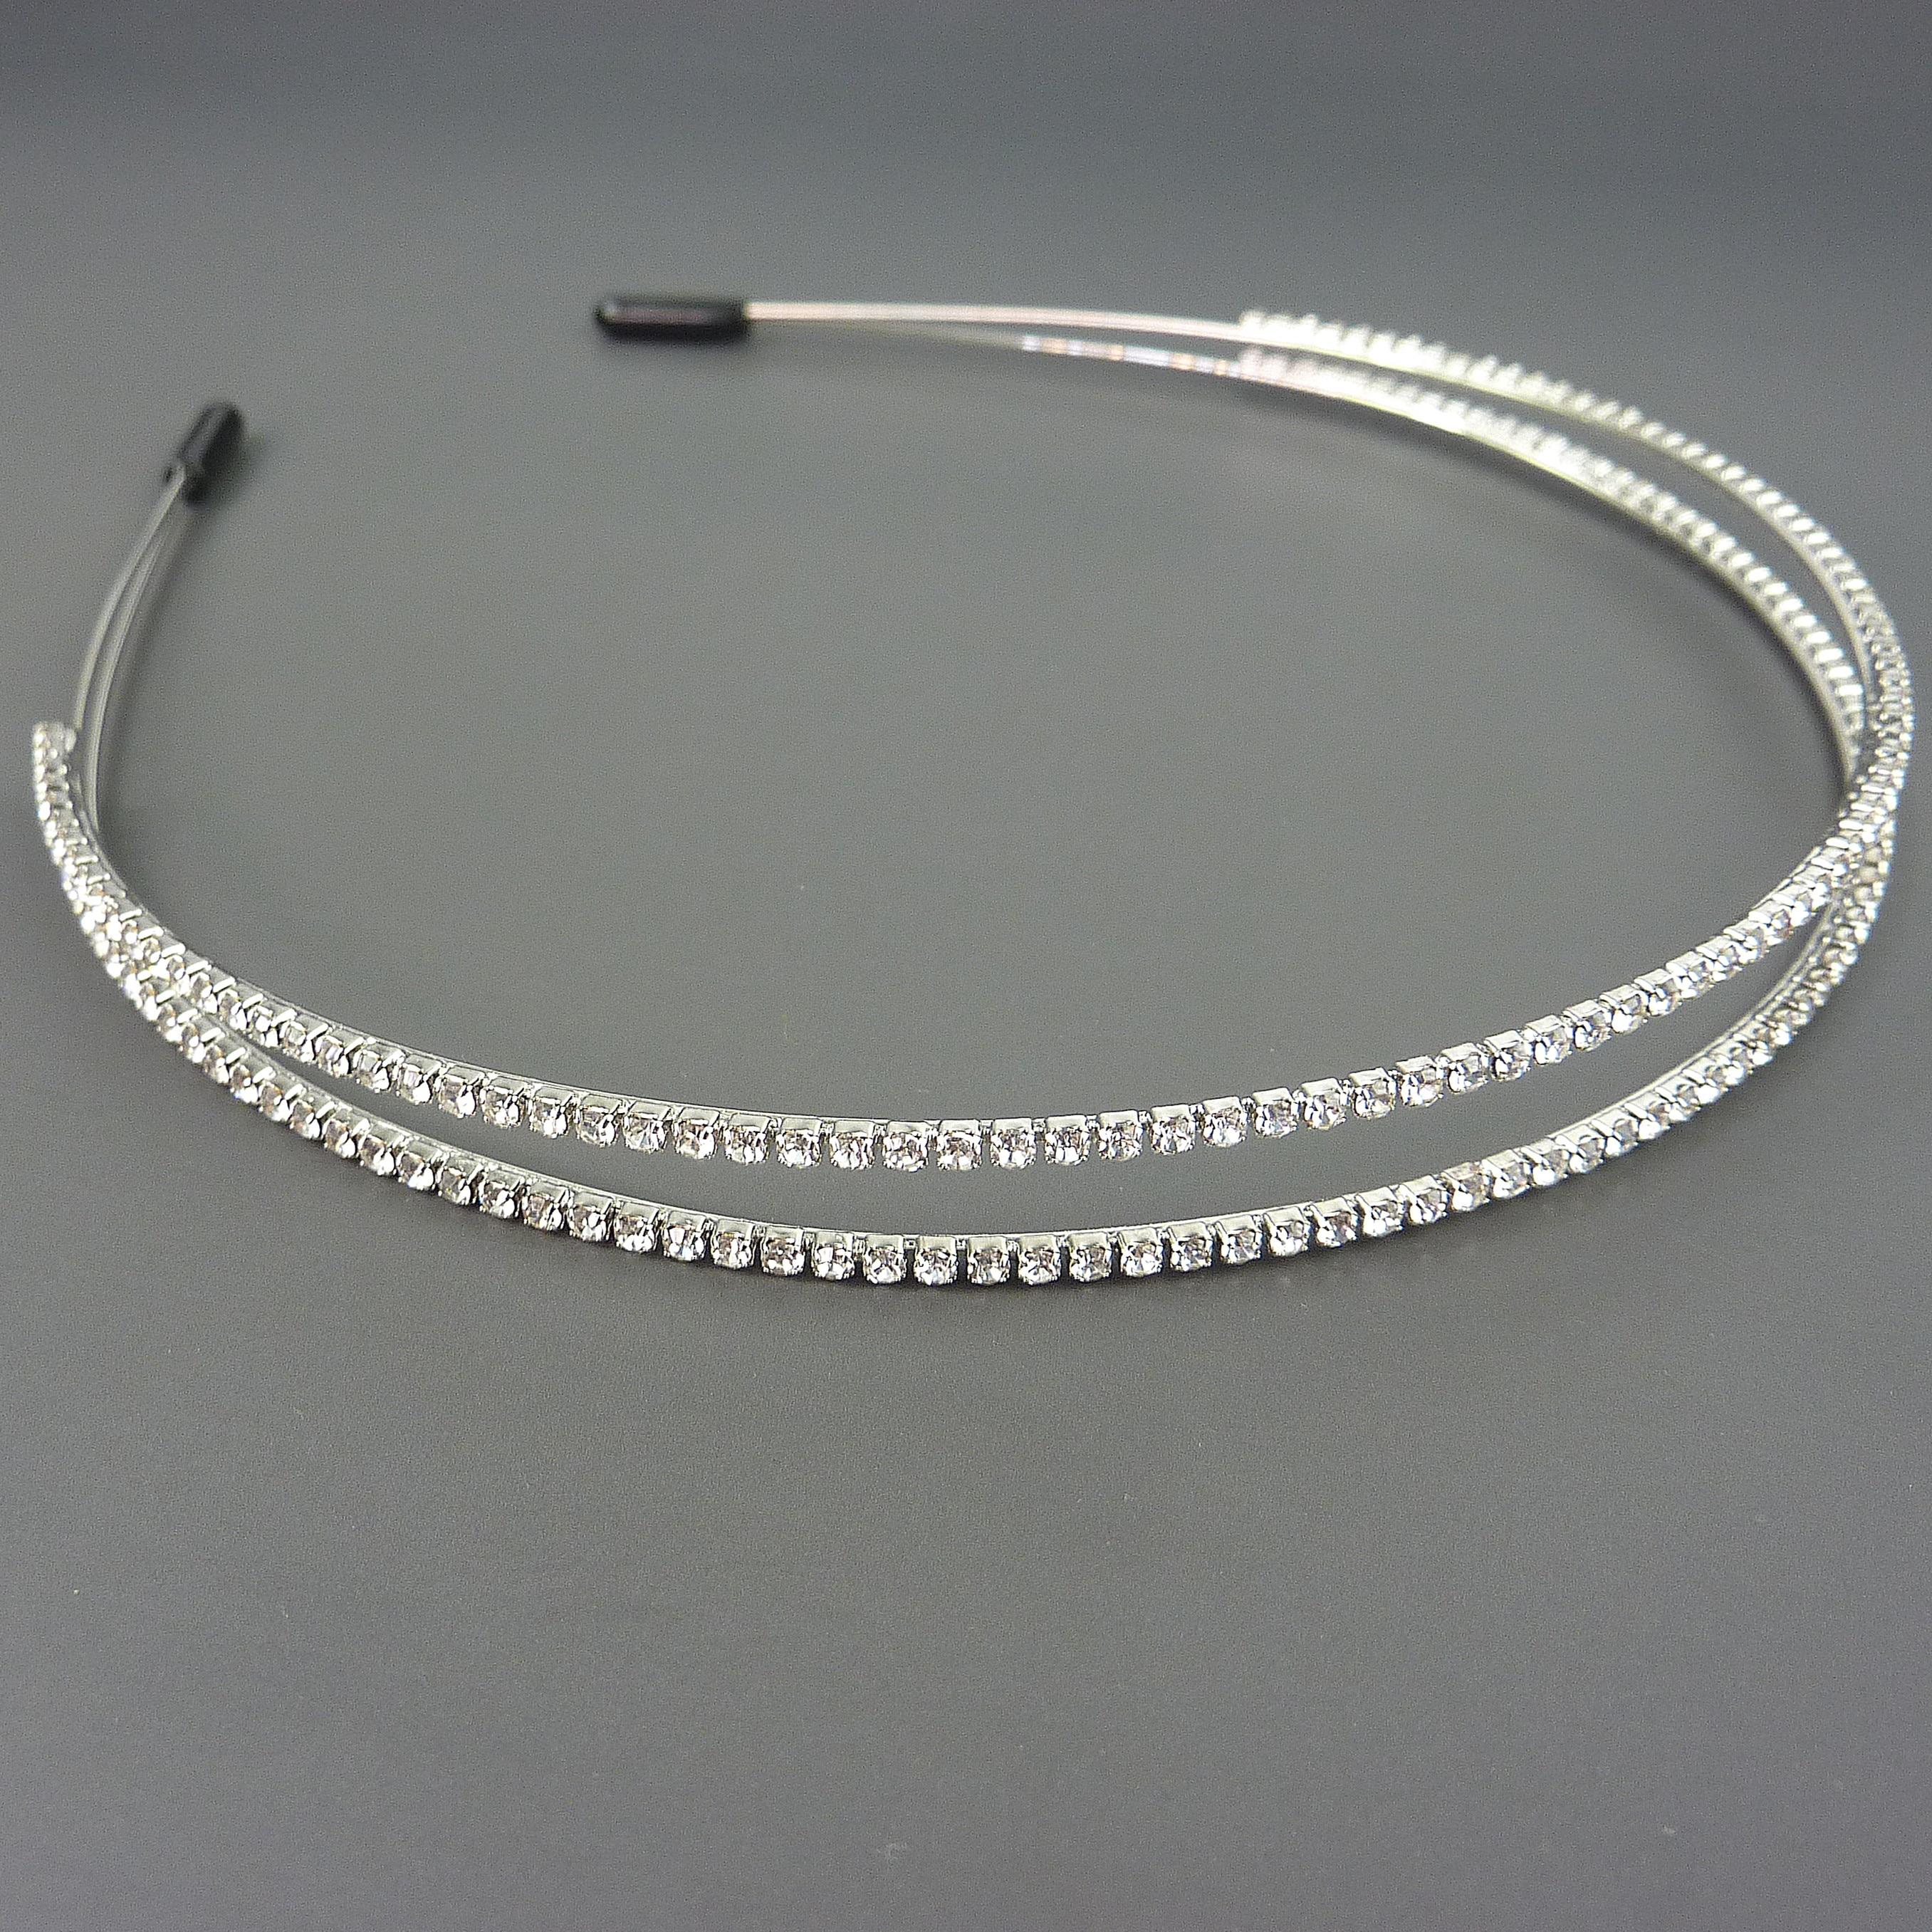 R024180 CORUIXI exquisita diadema de corona a la moda, peine de Zirconia brillante para mujer, tocados de diamantes de imitación, accesorios de joyería de moda